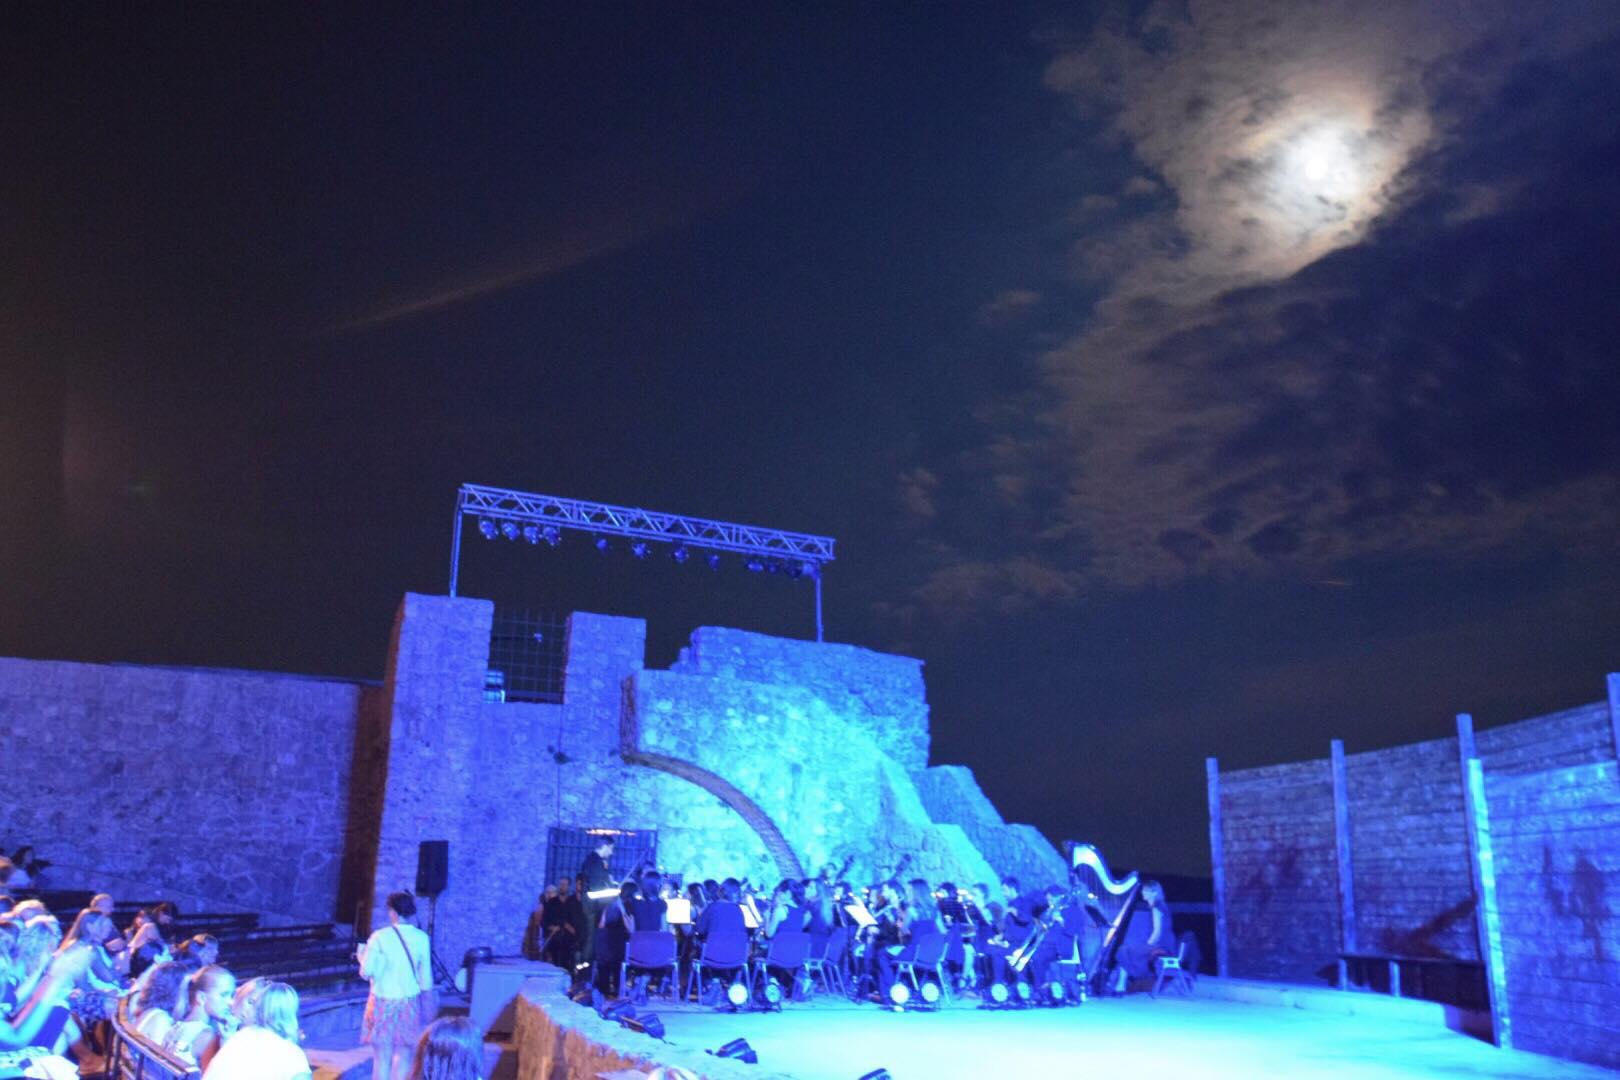 Kach Solo Travels Day 11: Experienced the Opera Festival 2018 in Herceg Novi, Montenegro! ⭐️